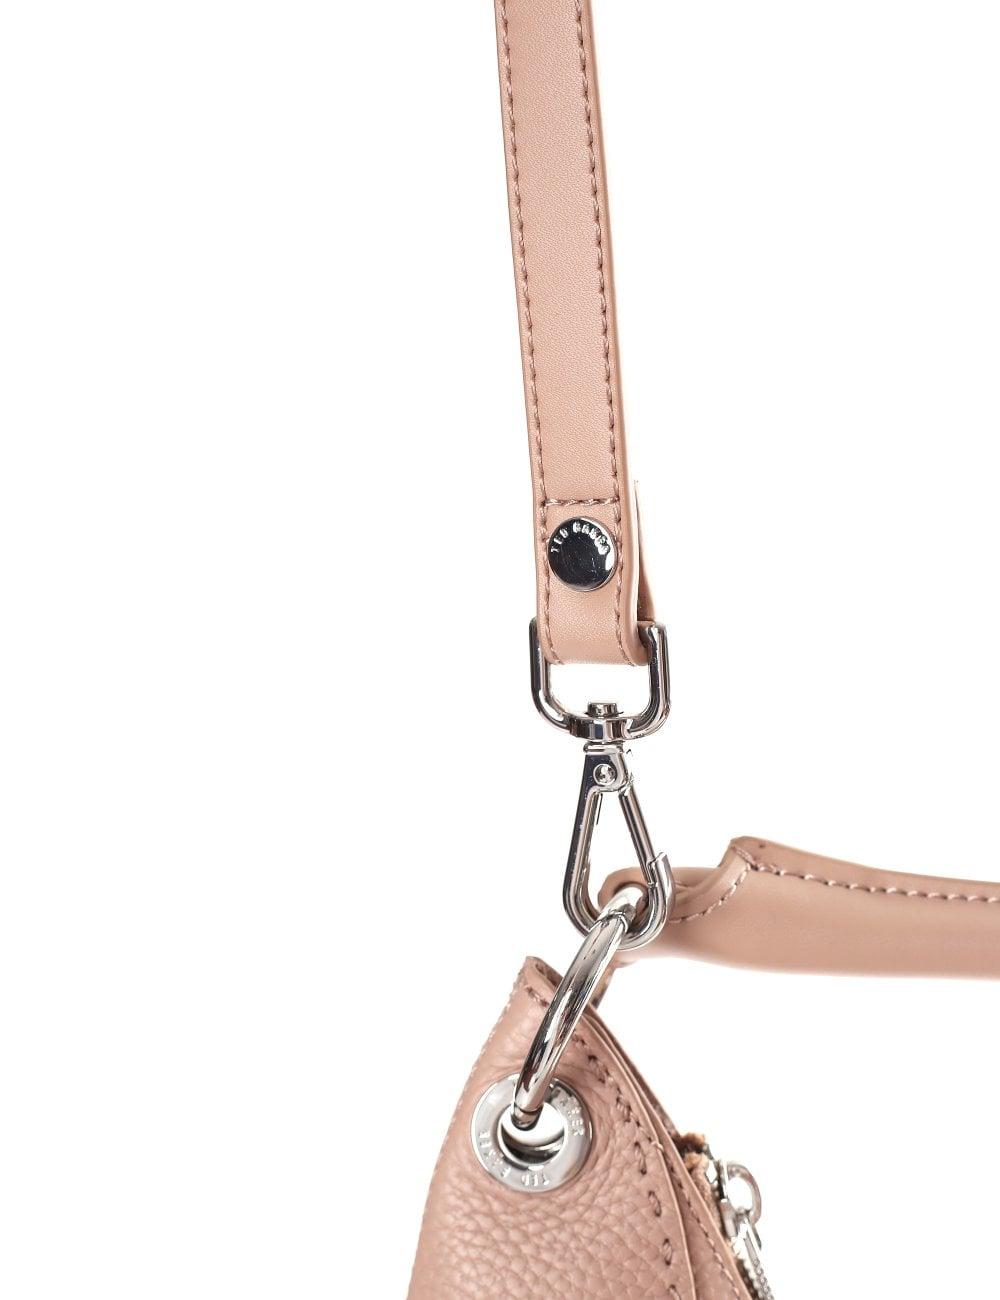 85833bb7aee0 Ted Baker Women s Mariele Stab Stitch Hobo Bag